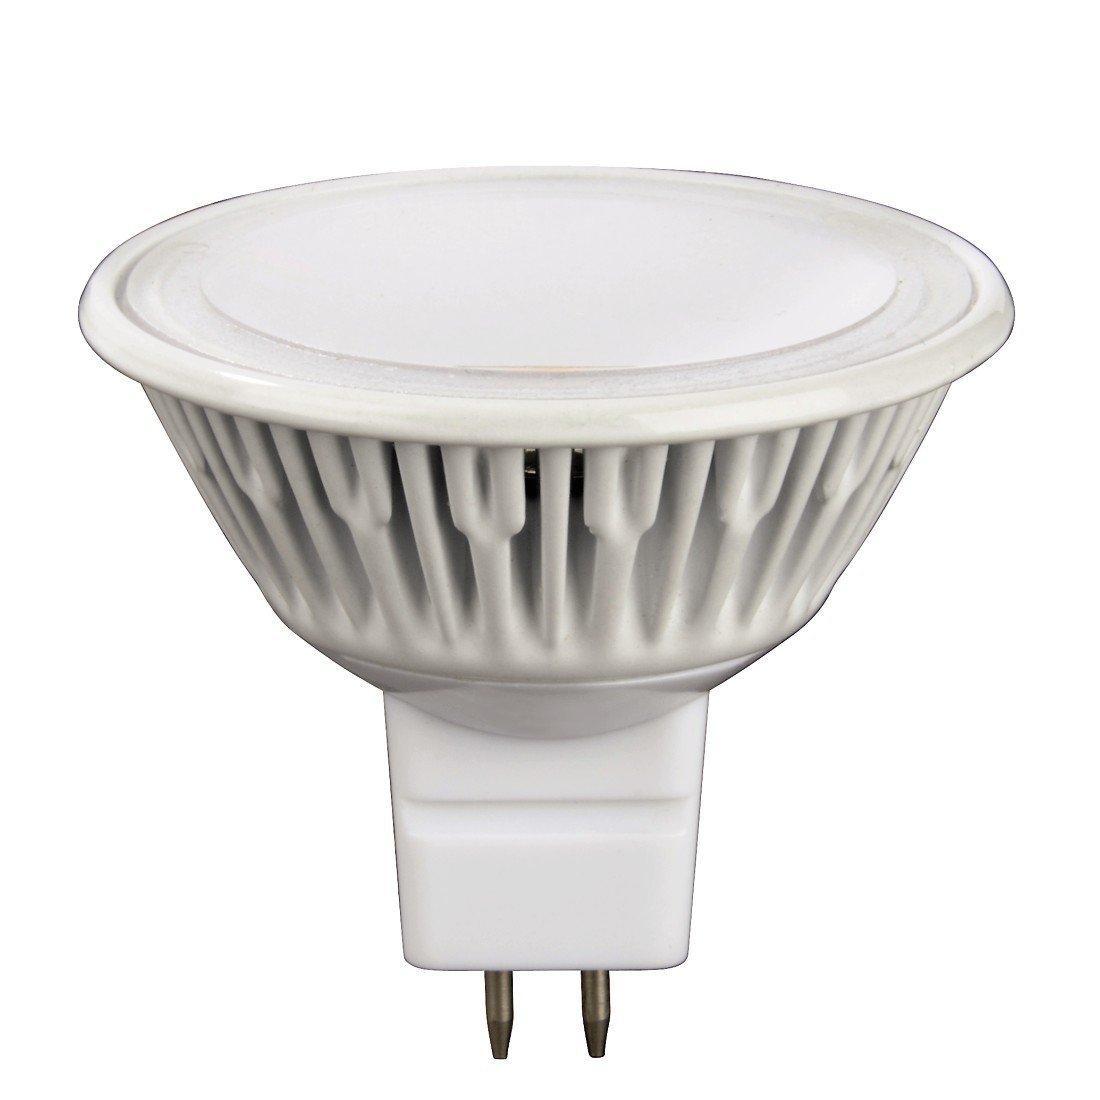 xavax led lampe gu5 3 5 5w ersetzt 30w 275 lm. Black Bedroom Furniture Sets. Home Design Ideas